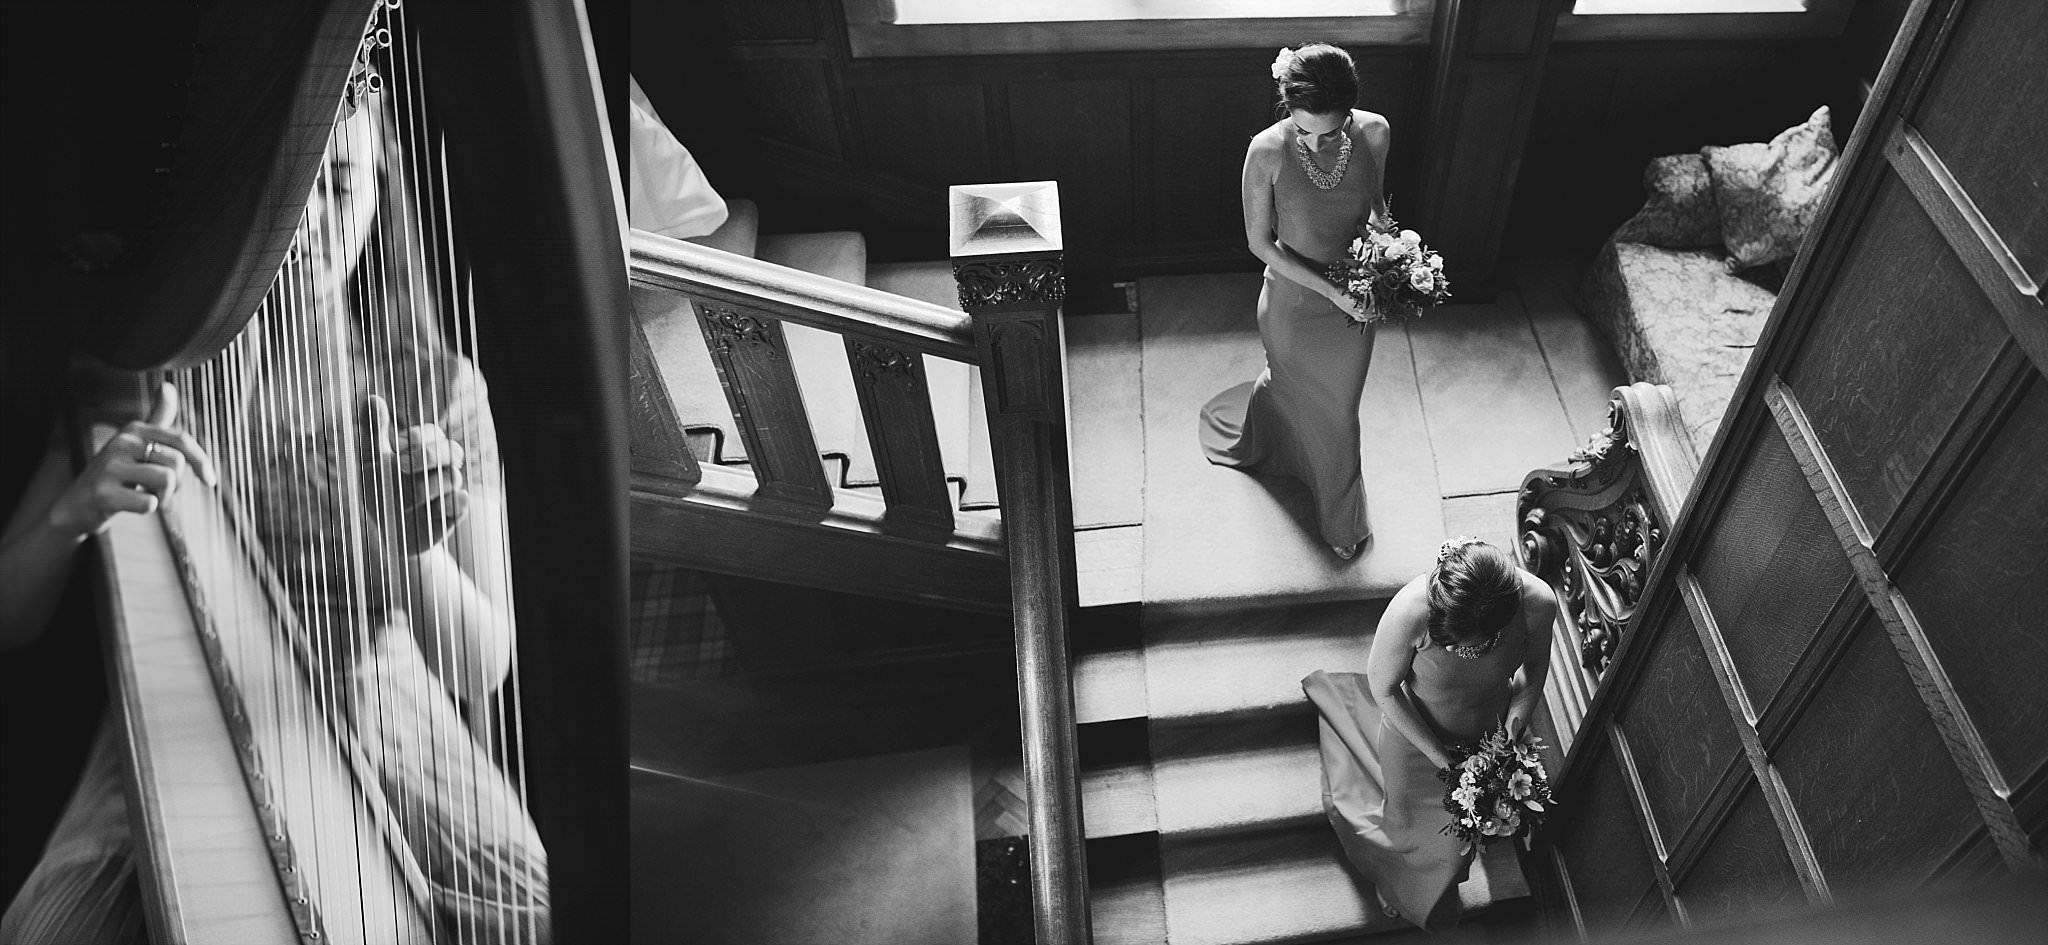 Fine Art Wedding Photographers,The Gibsons,elegant wedding photographers glasgow,fine art wedding,natural wedding photographers,romantic photographers Scotland,two wedding photographers scotland,wedding photographers scotland,wedding roman camp,